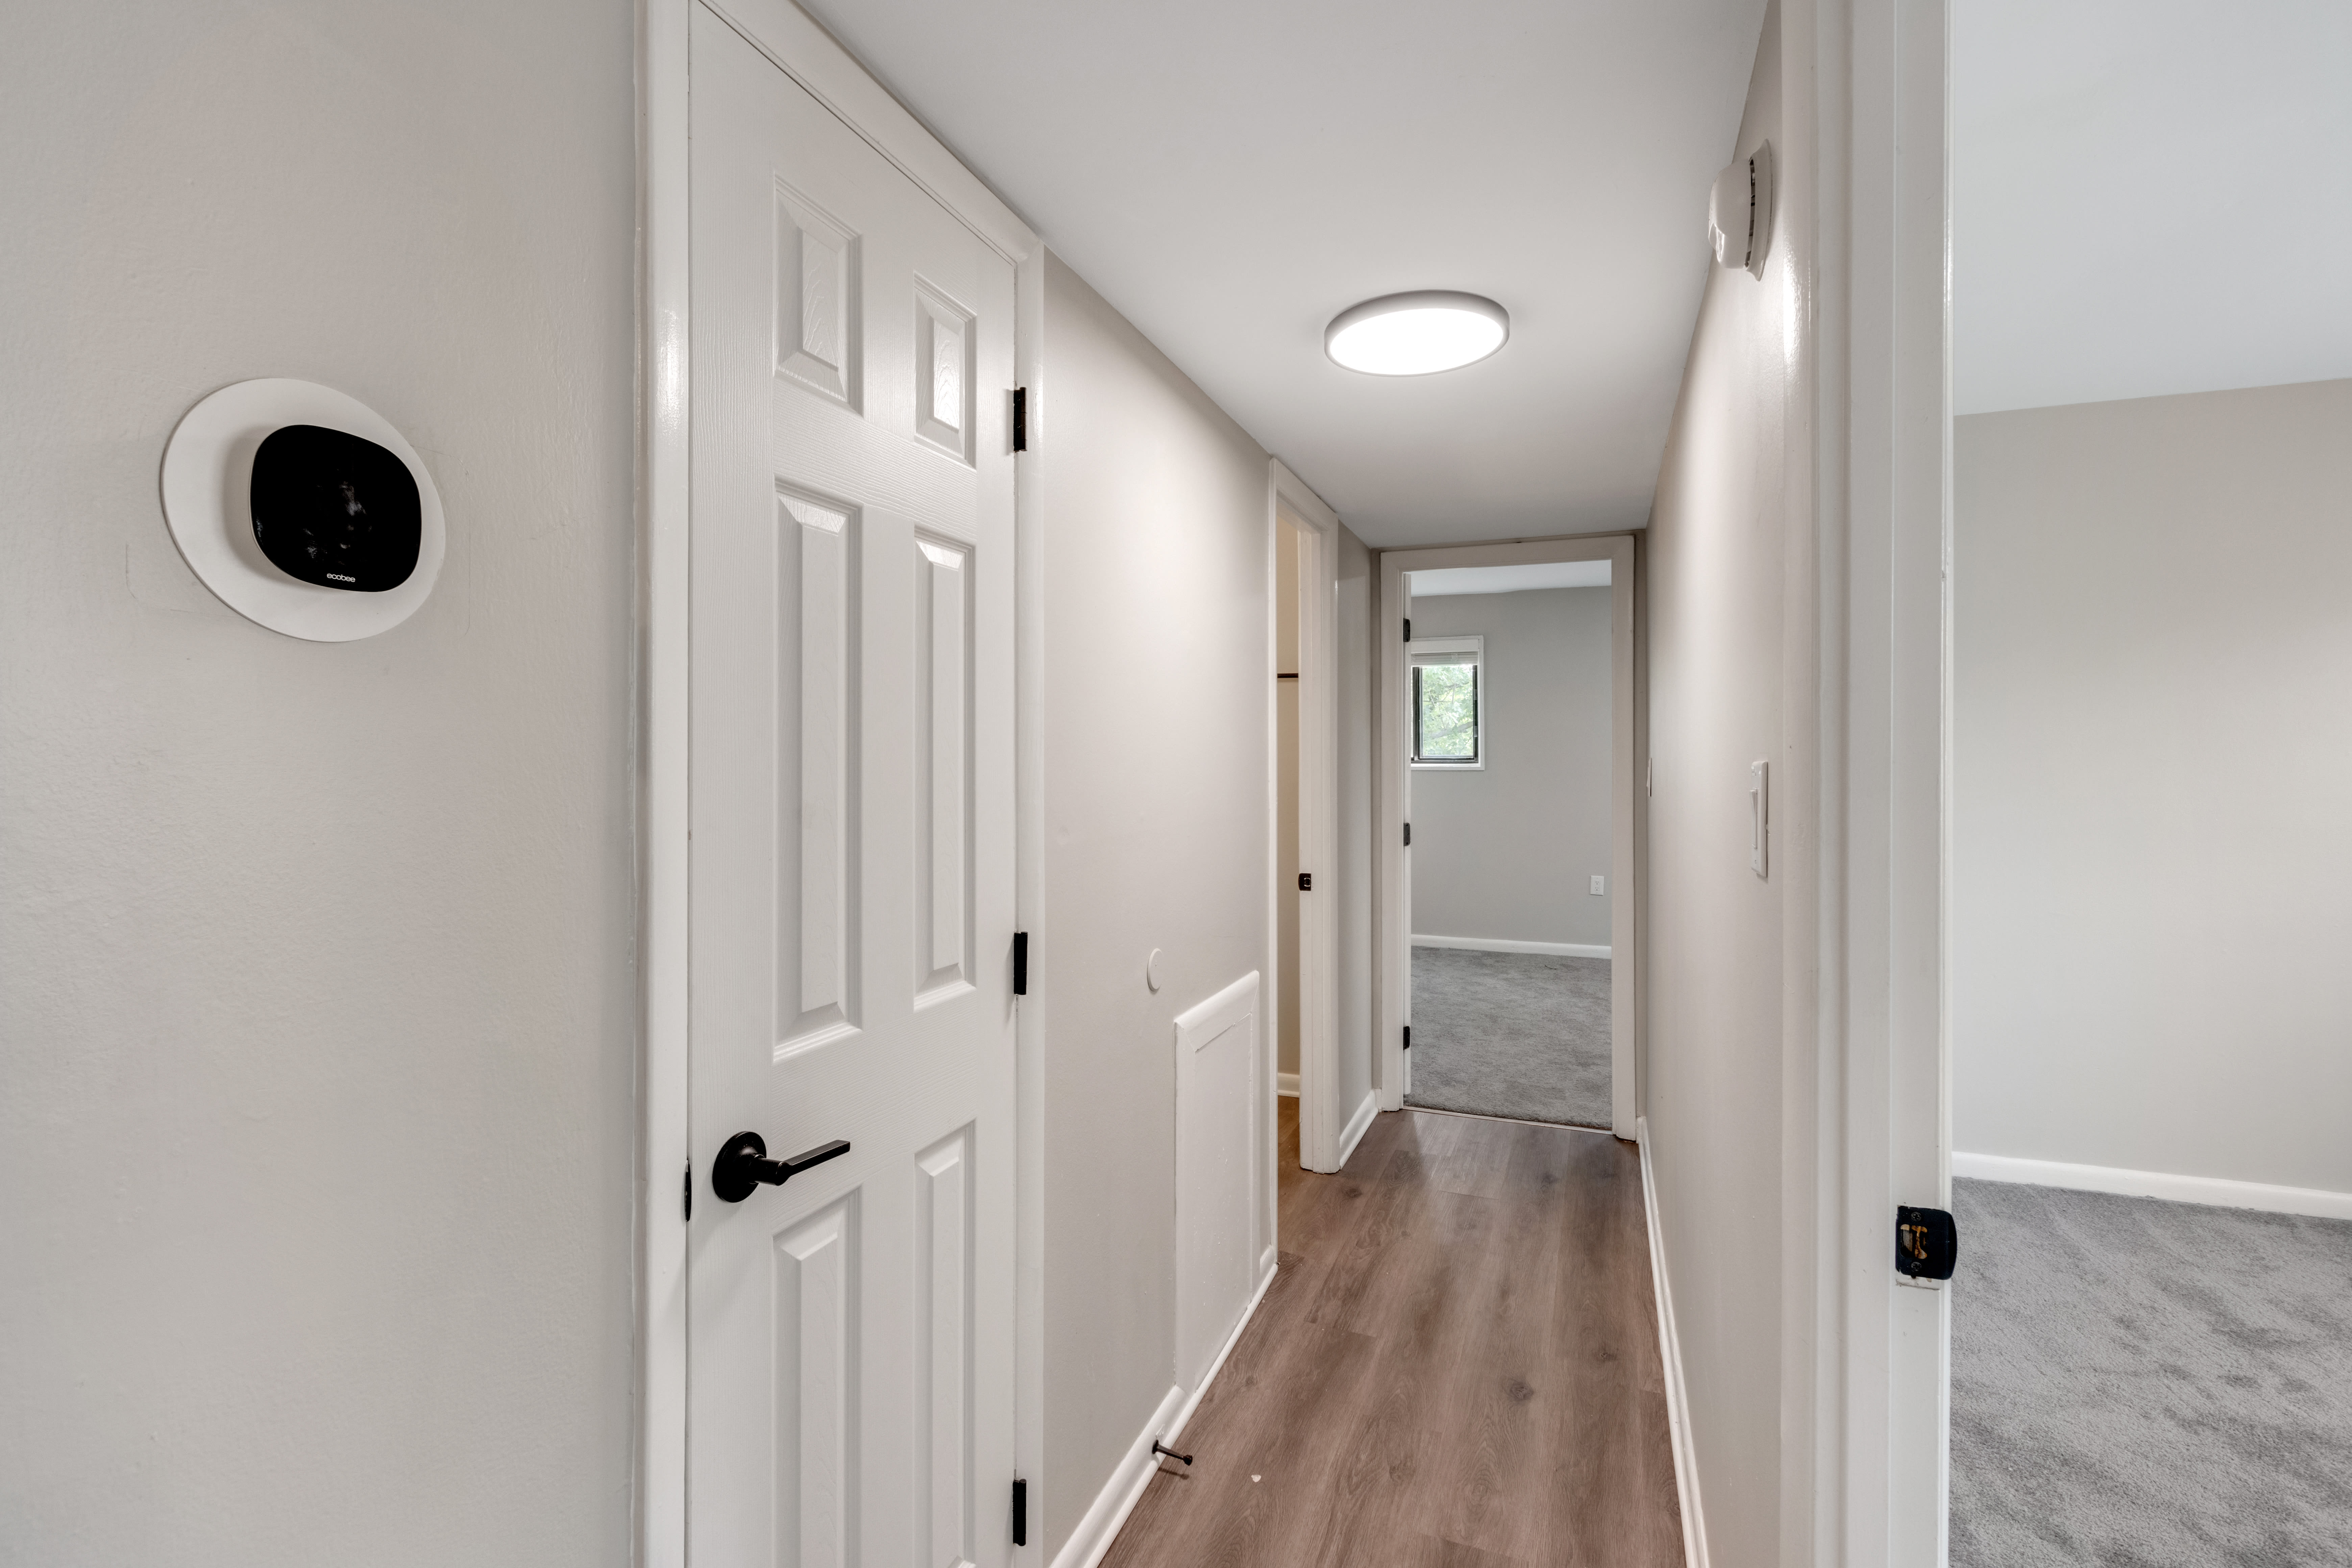 Hallway at Regency Pointe in Forestville, Maryland